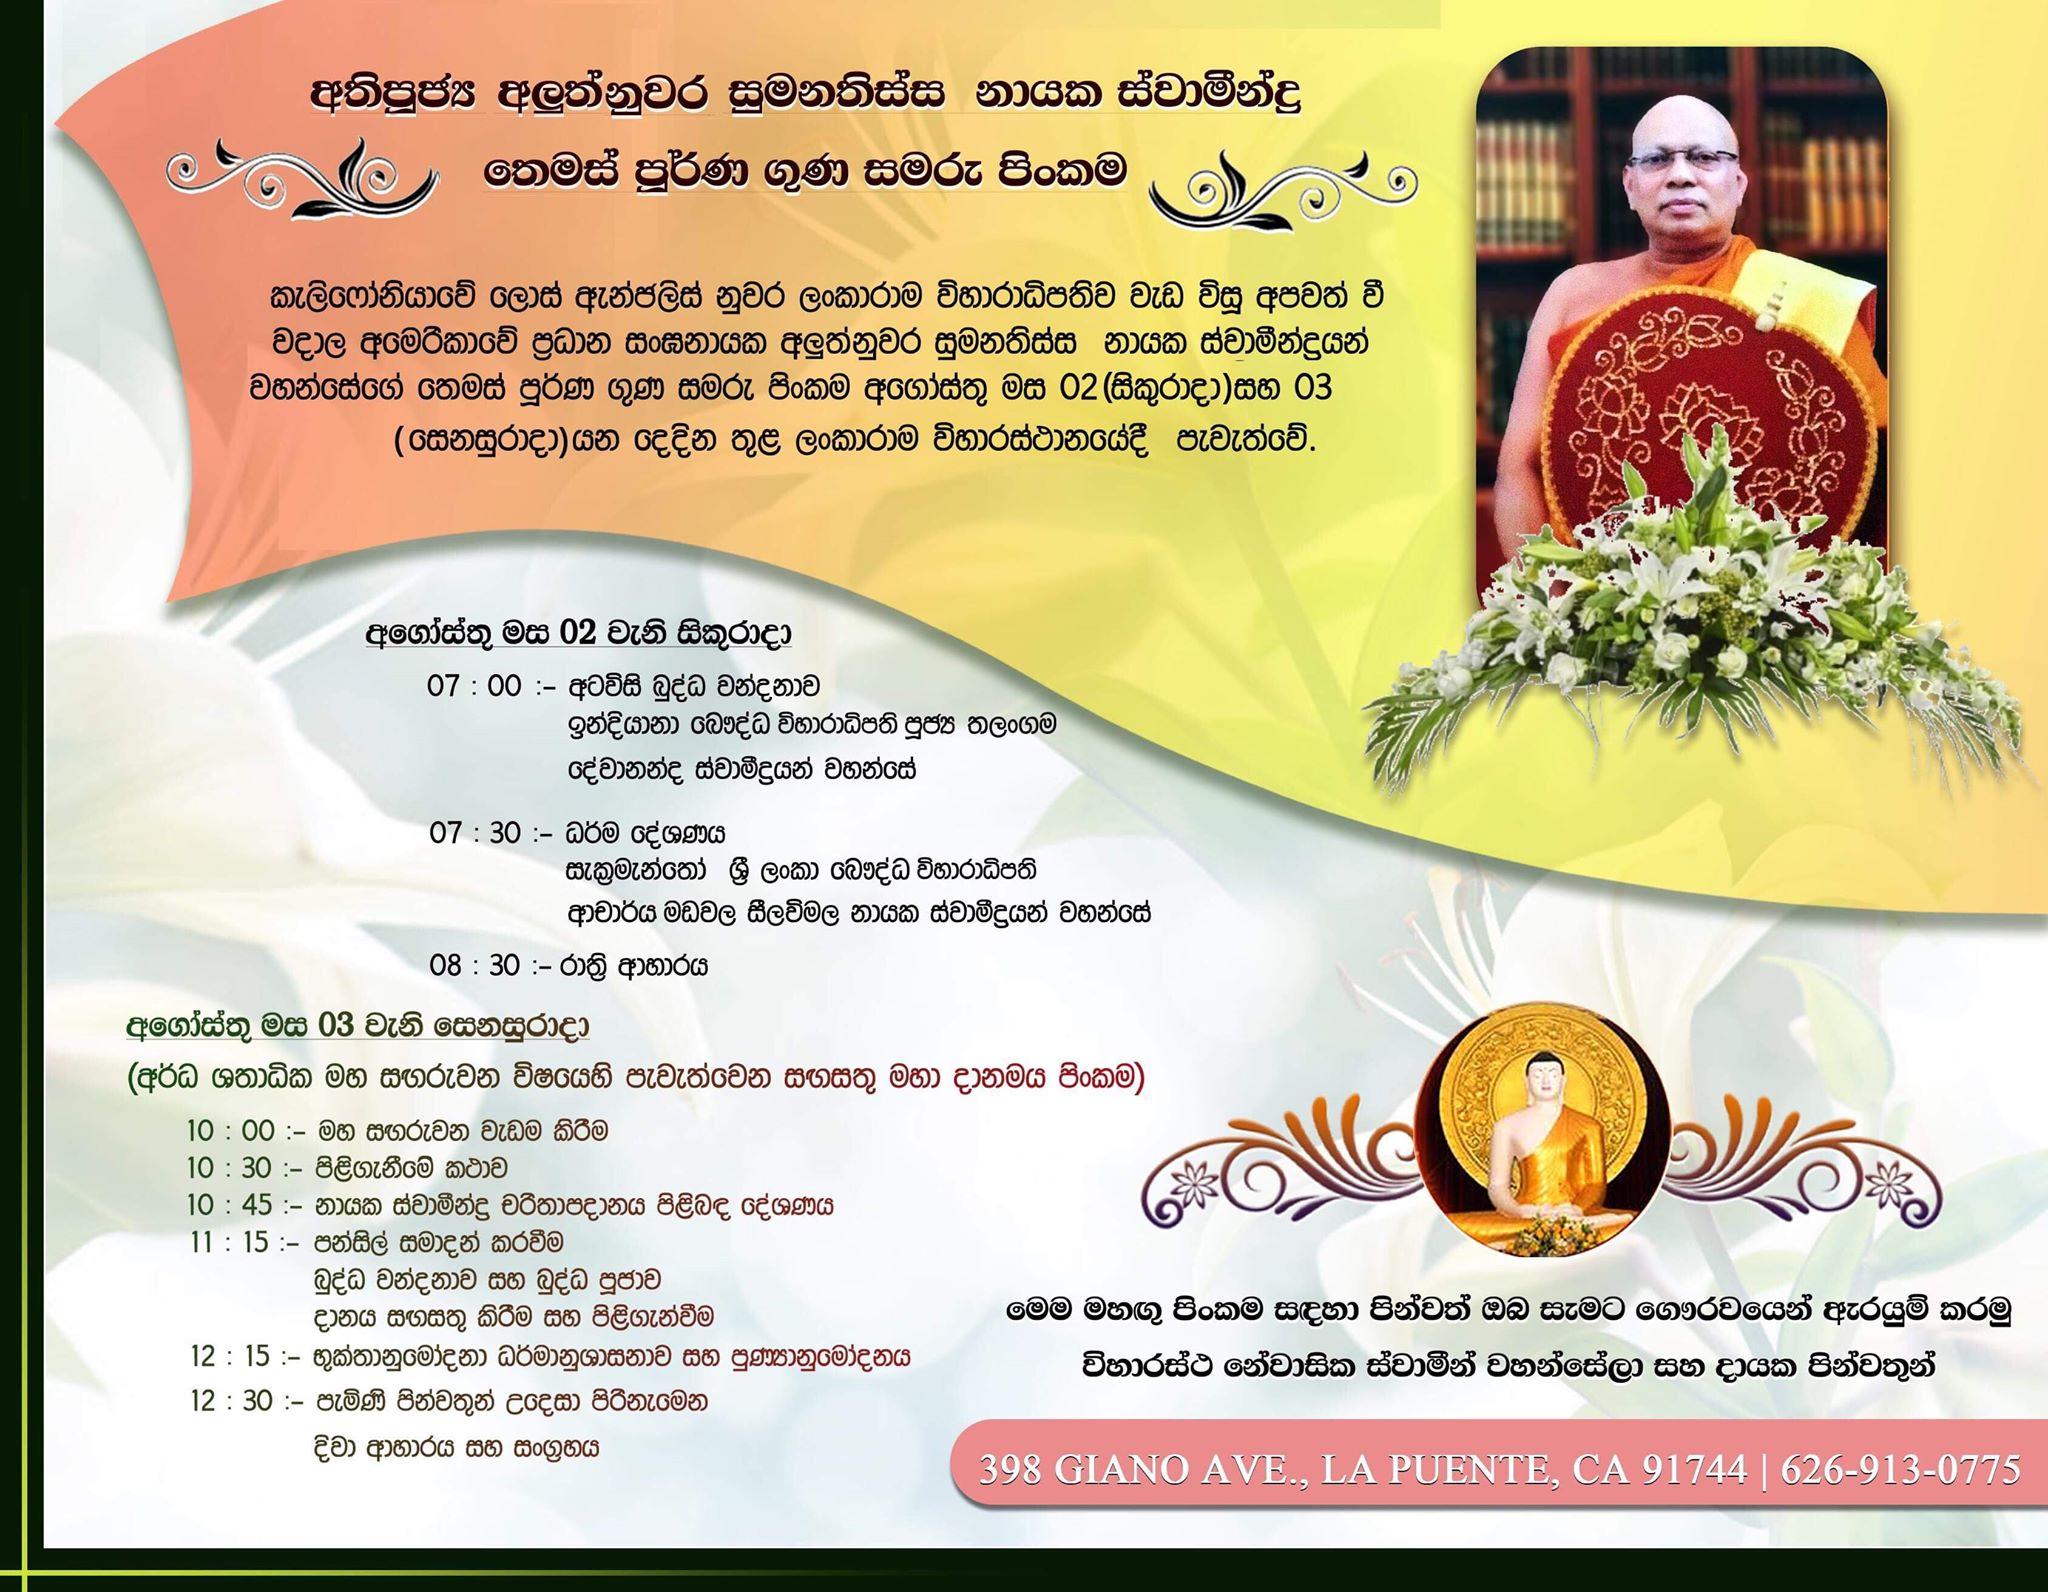 Religious Ceremony in memory of  Ven. Aluthnuwara Sumanatissa